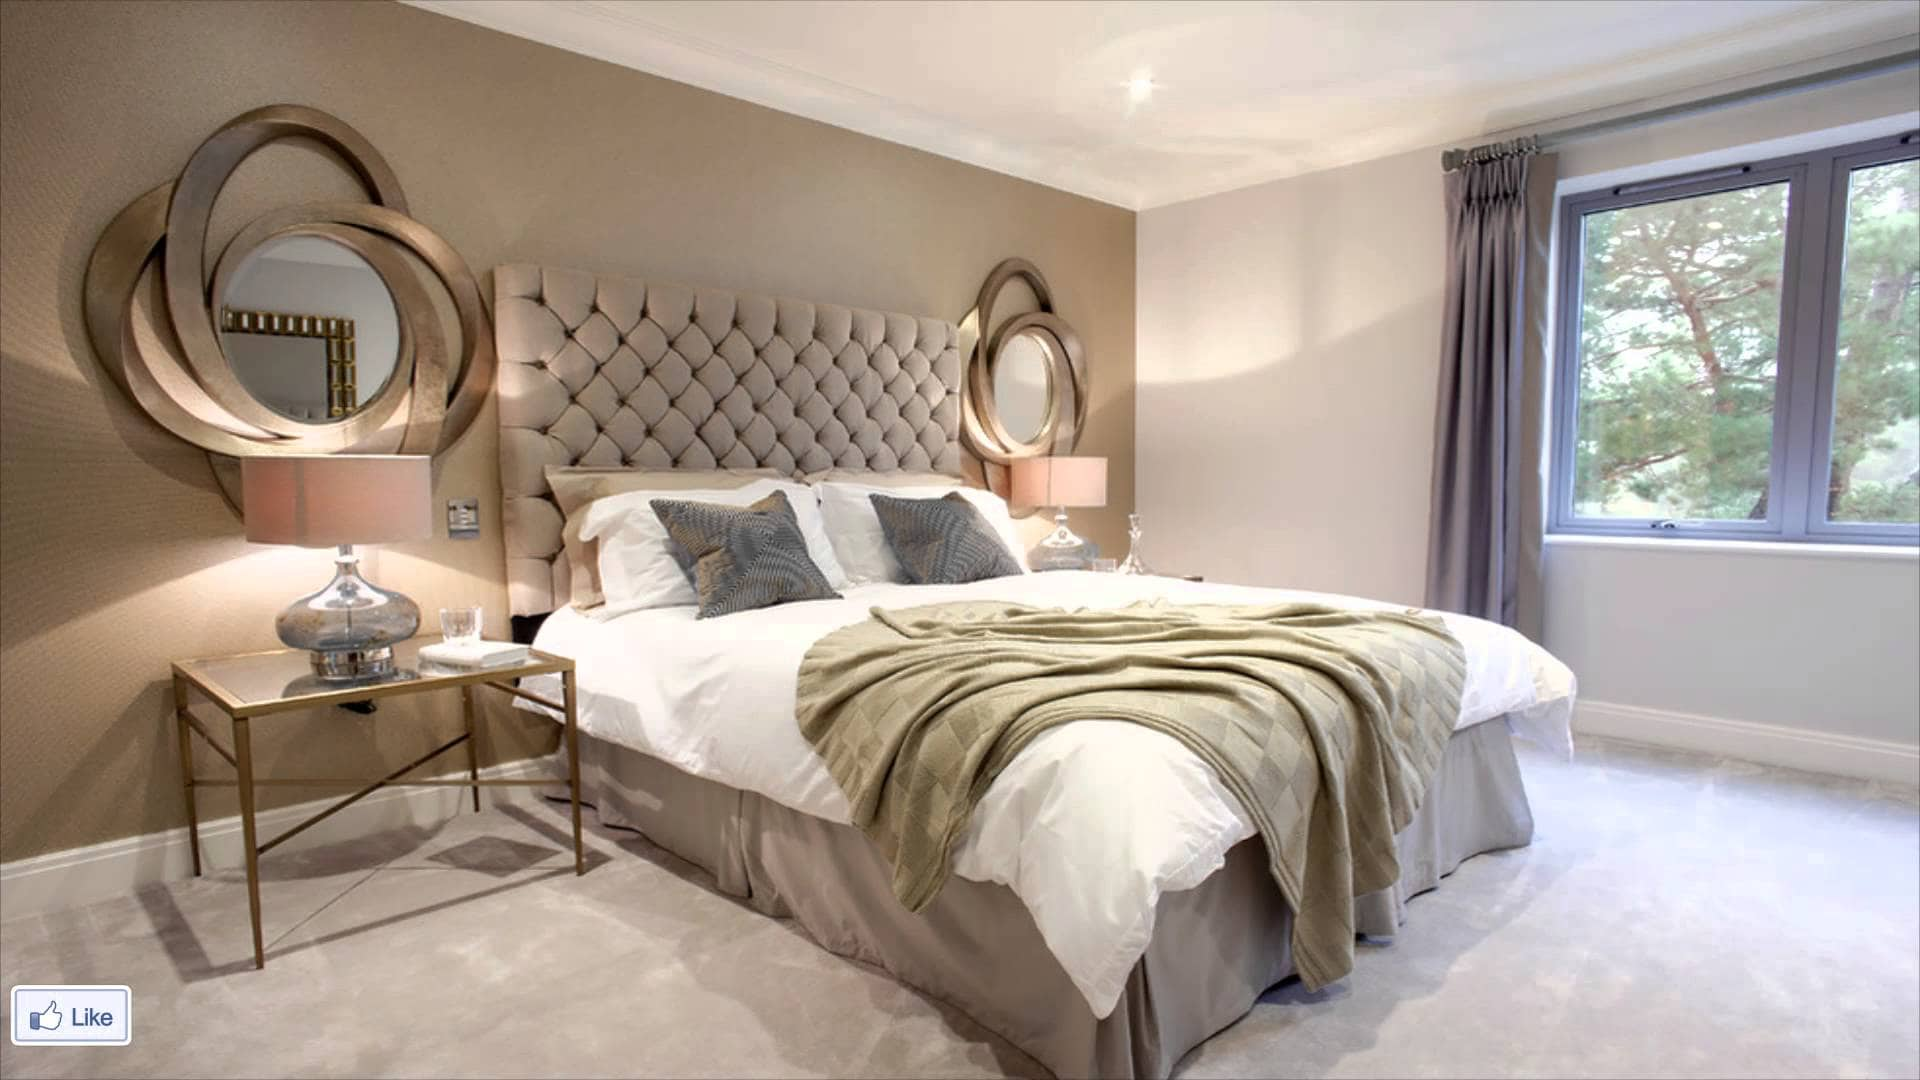 5 cabeceros de cama originales colch n expr s - Cabeceros de cama antiguos ...